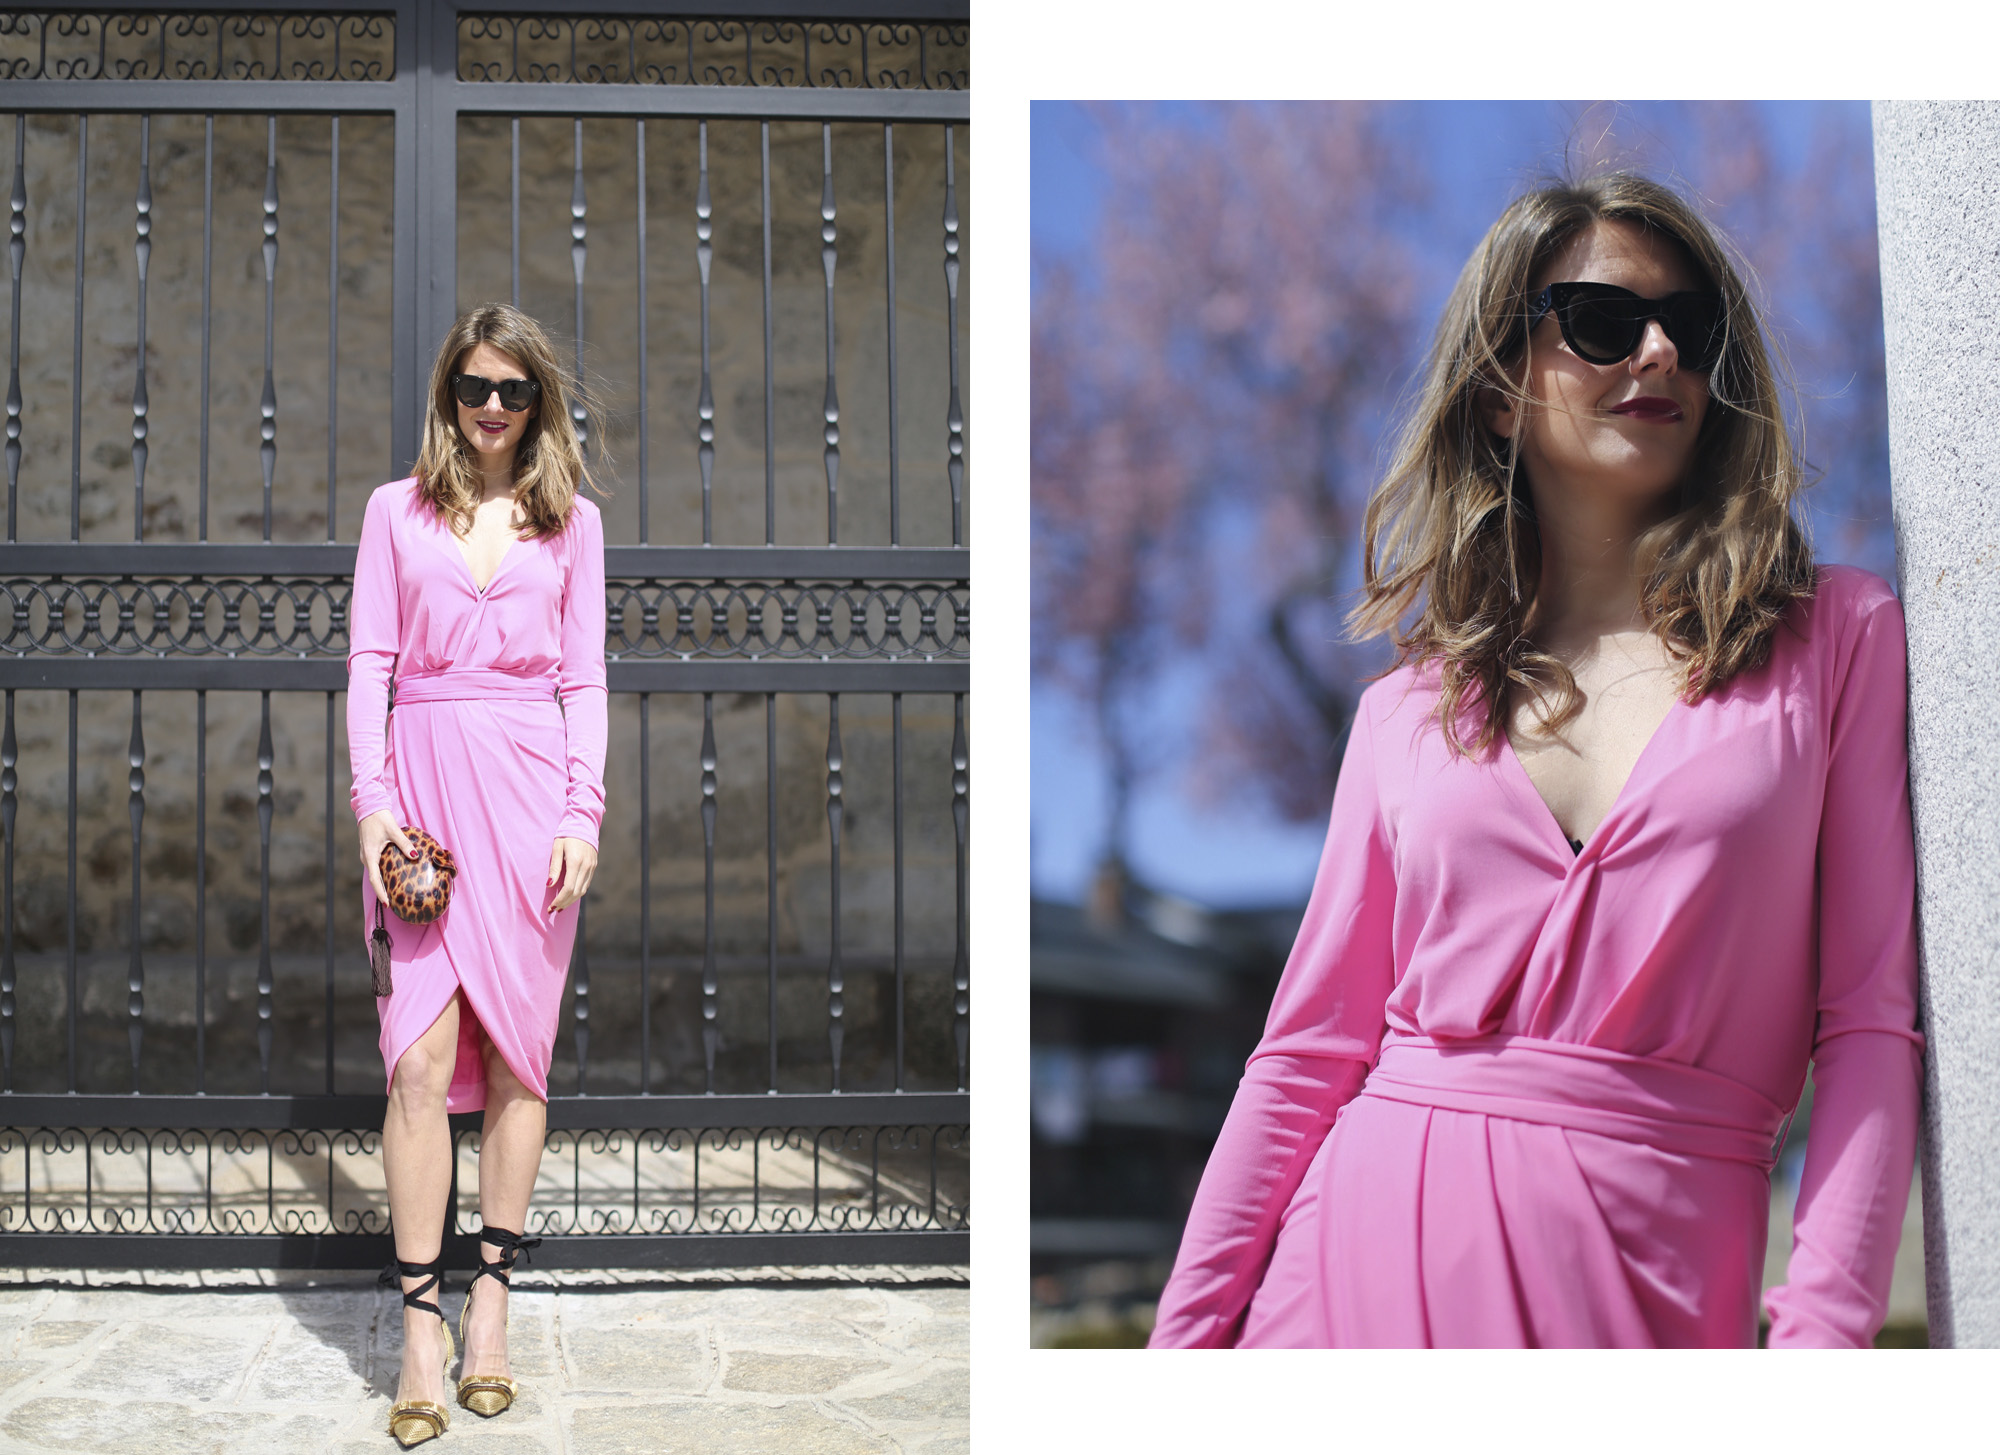 Clochet_streetstyle_BRUNA_brunacolection_vestido_moa_rosa1